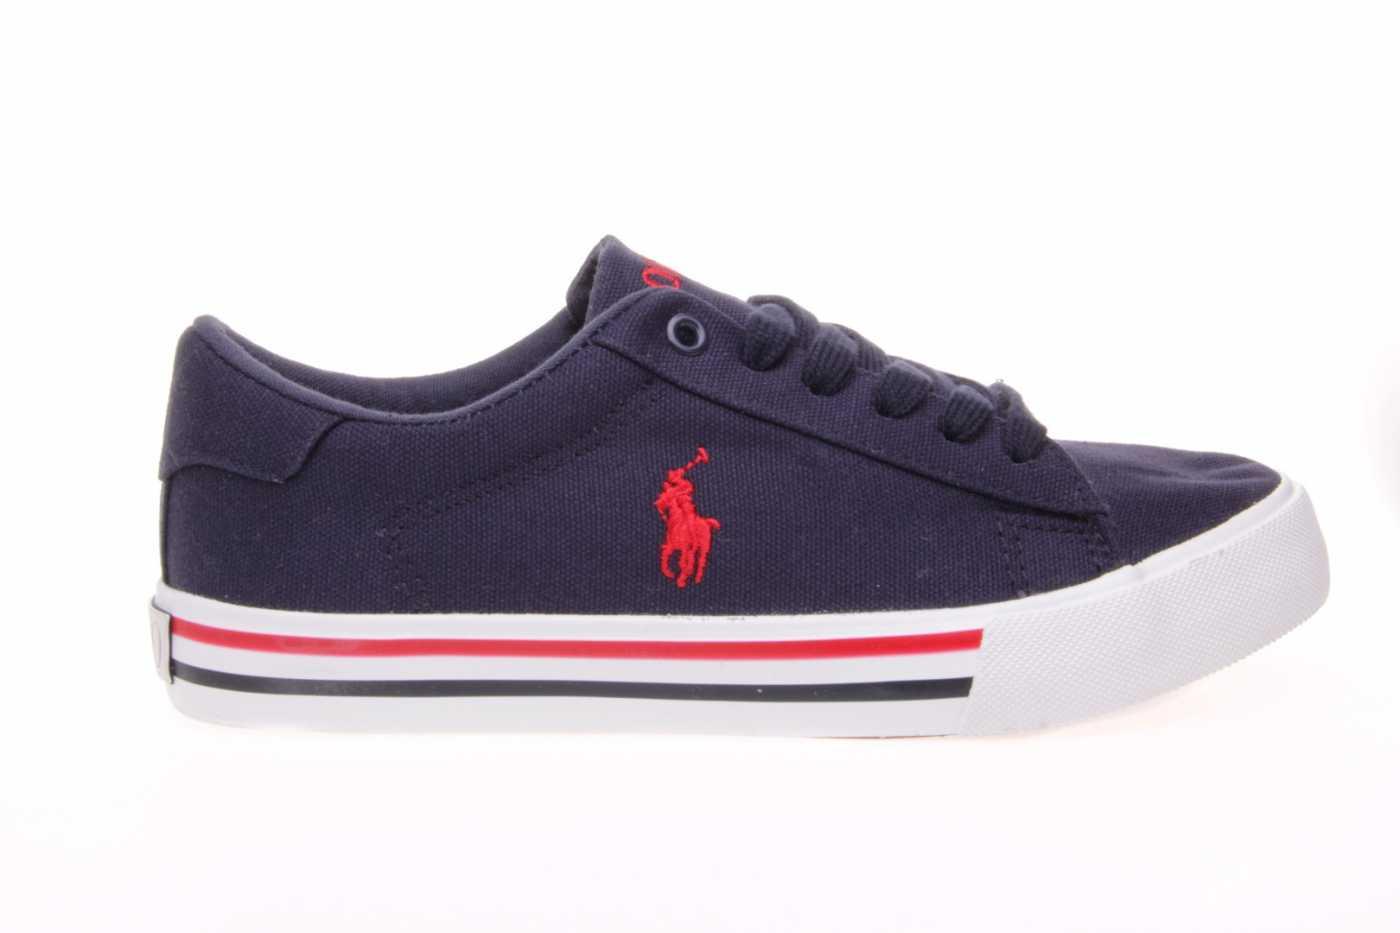 4852b86bc9b Comprar zapato tipo JOVEN NIÑO estilo LONA COLOR AZUL TEXTIL